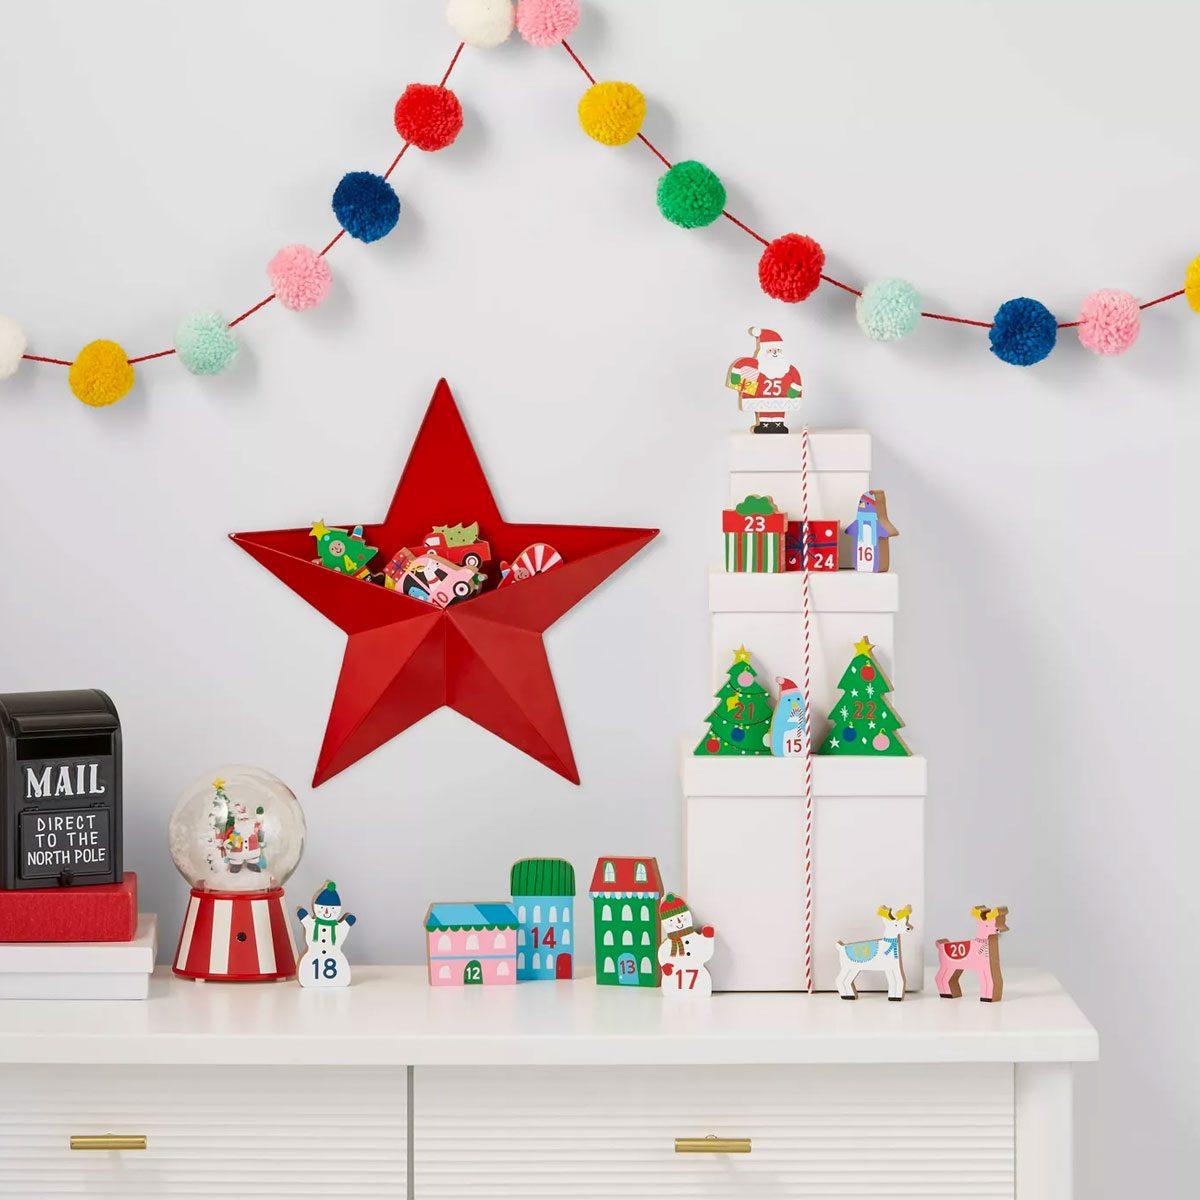 Children's Wooden Advent Calendar Scene